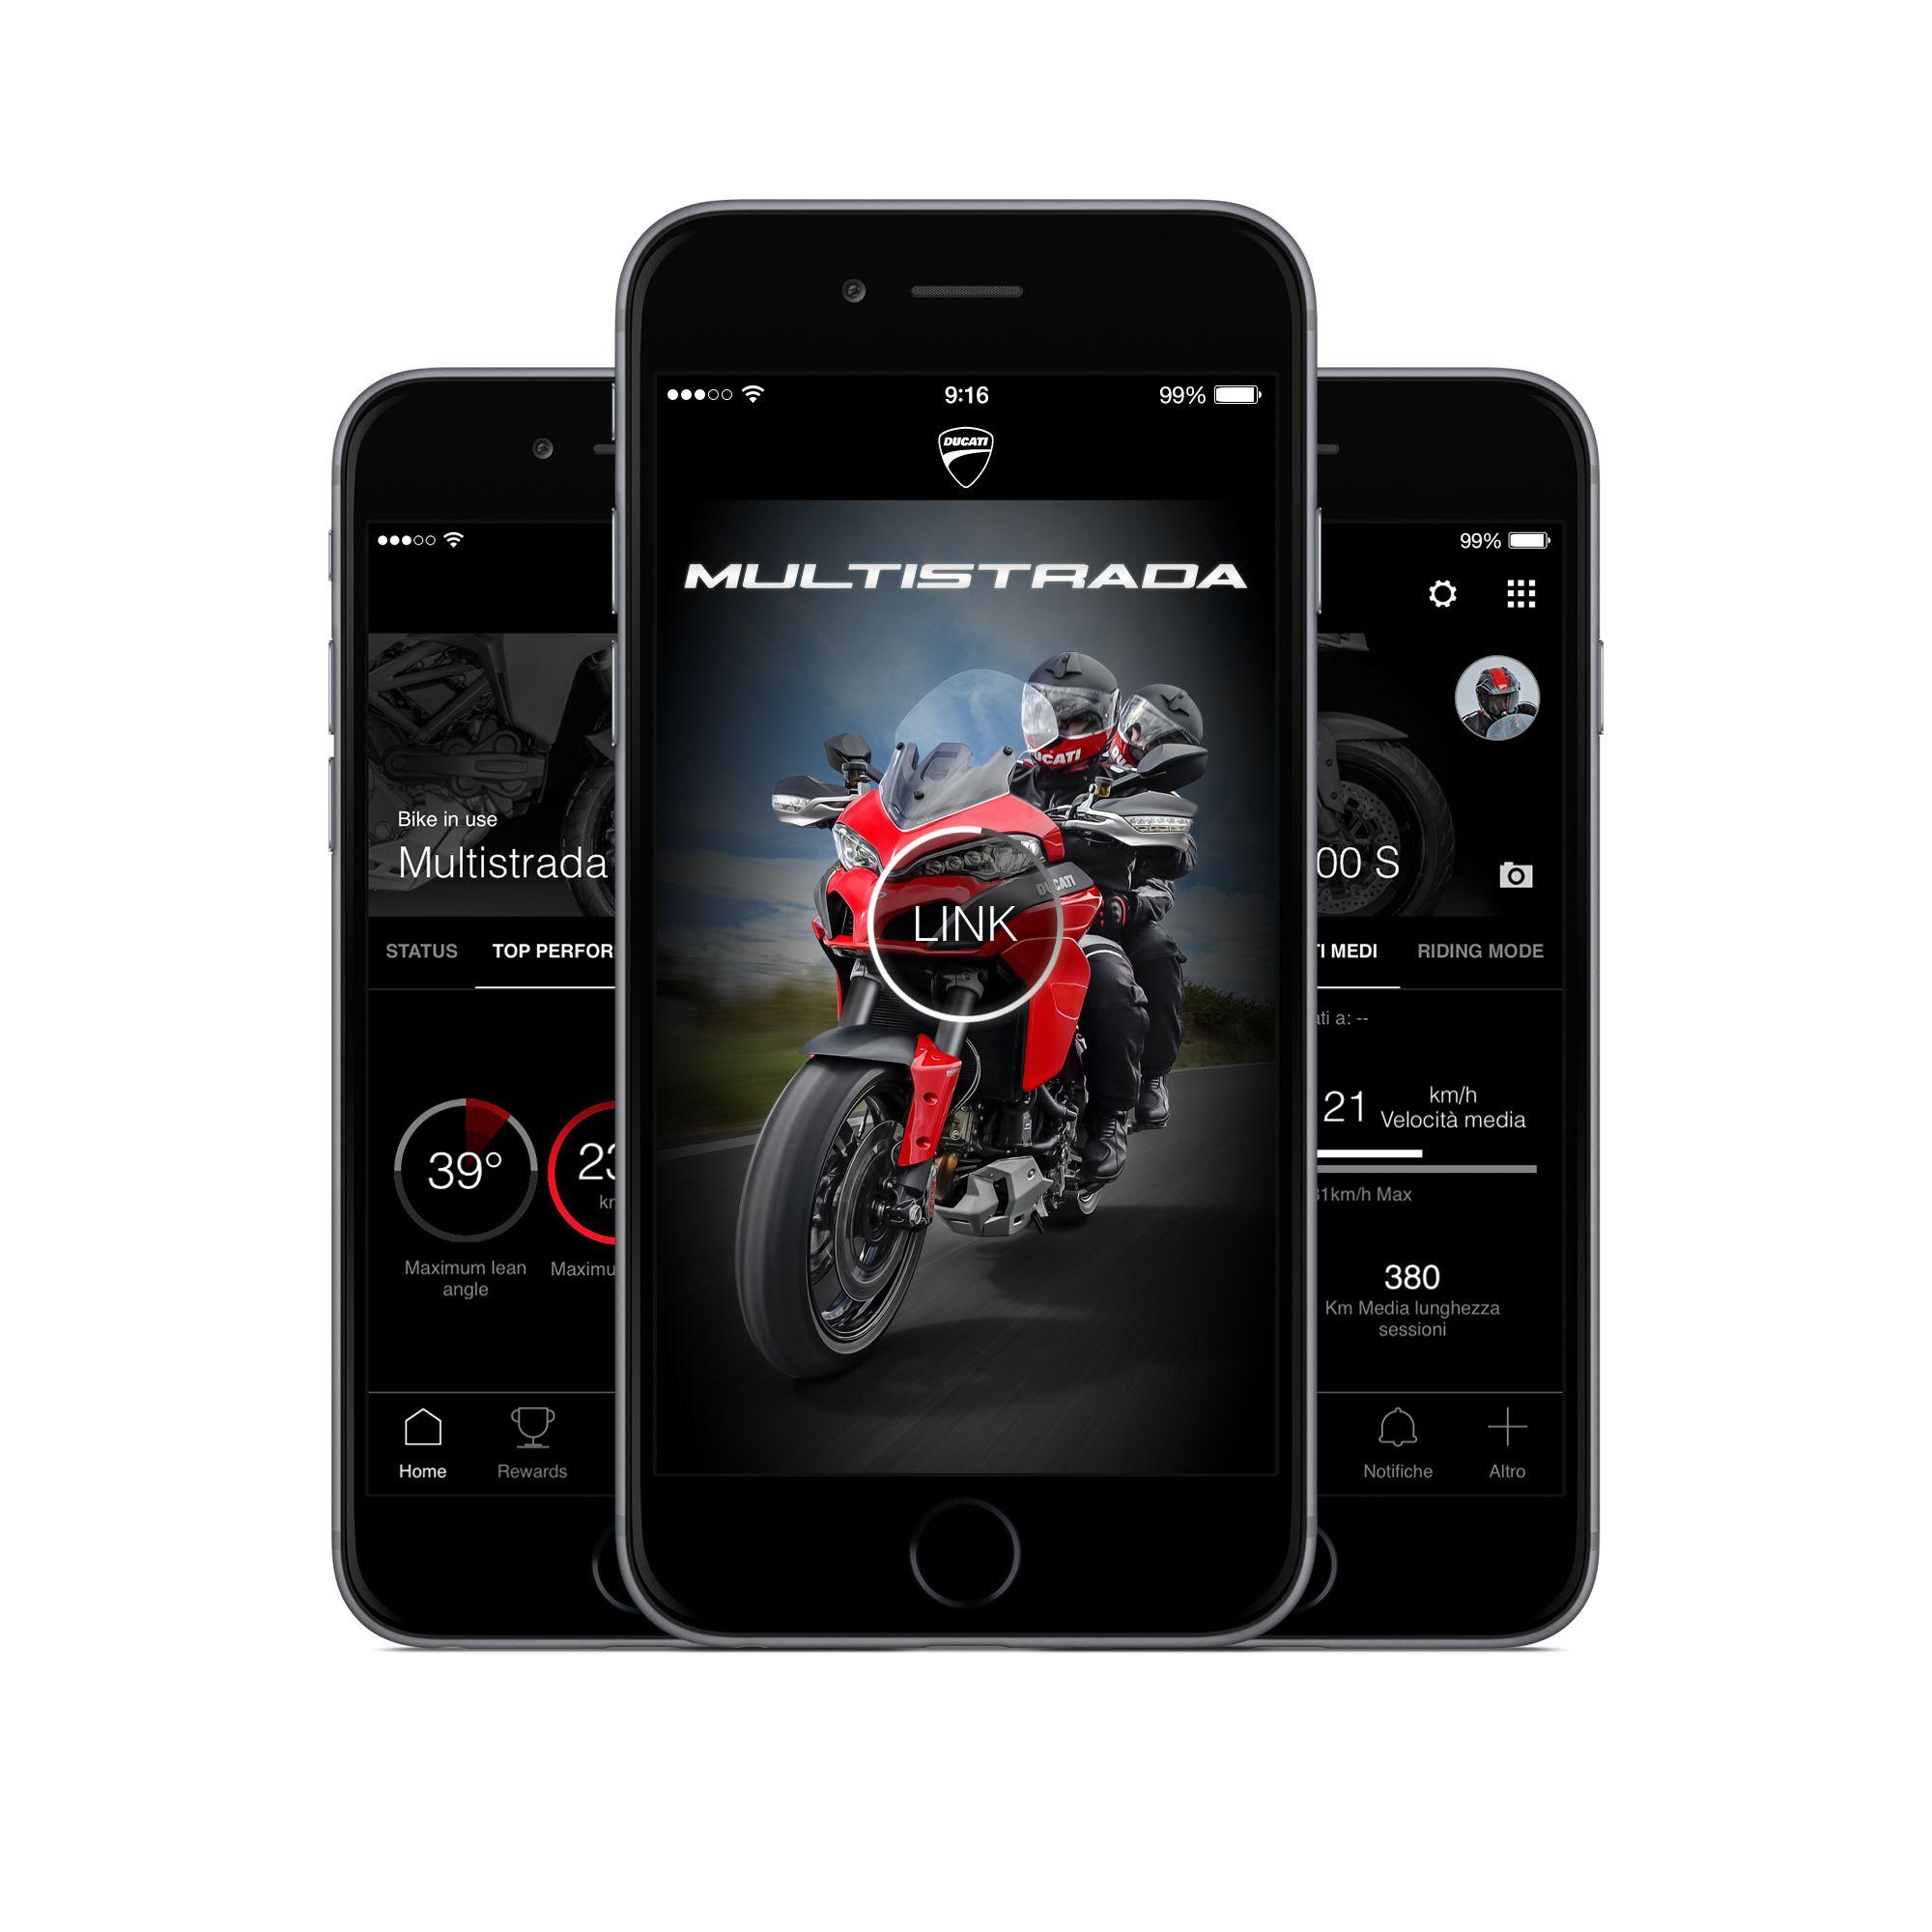 New app ducati link with images ducati multistrada